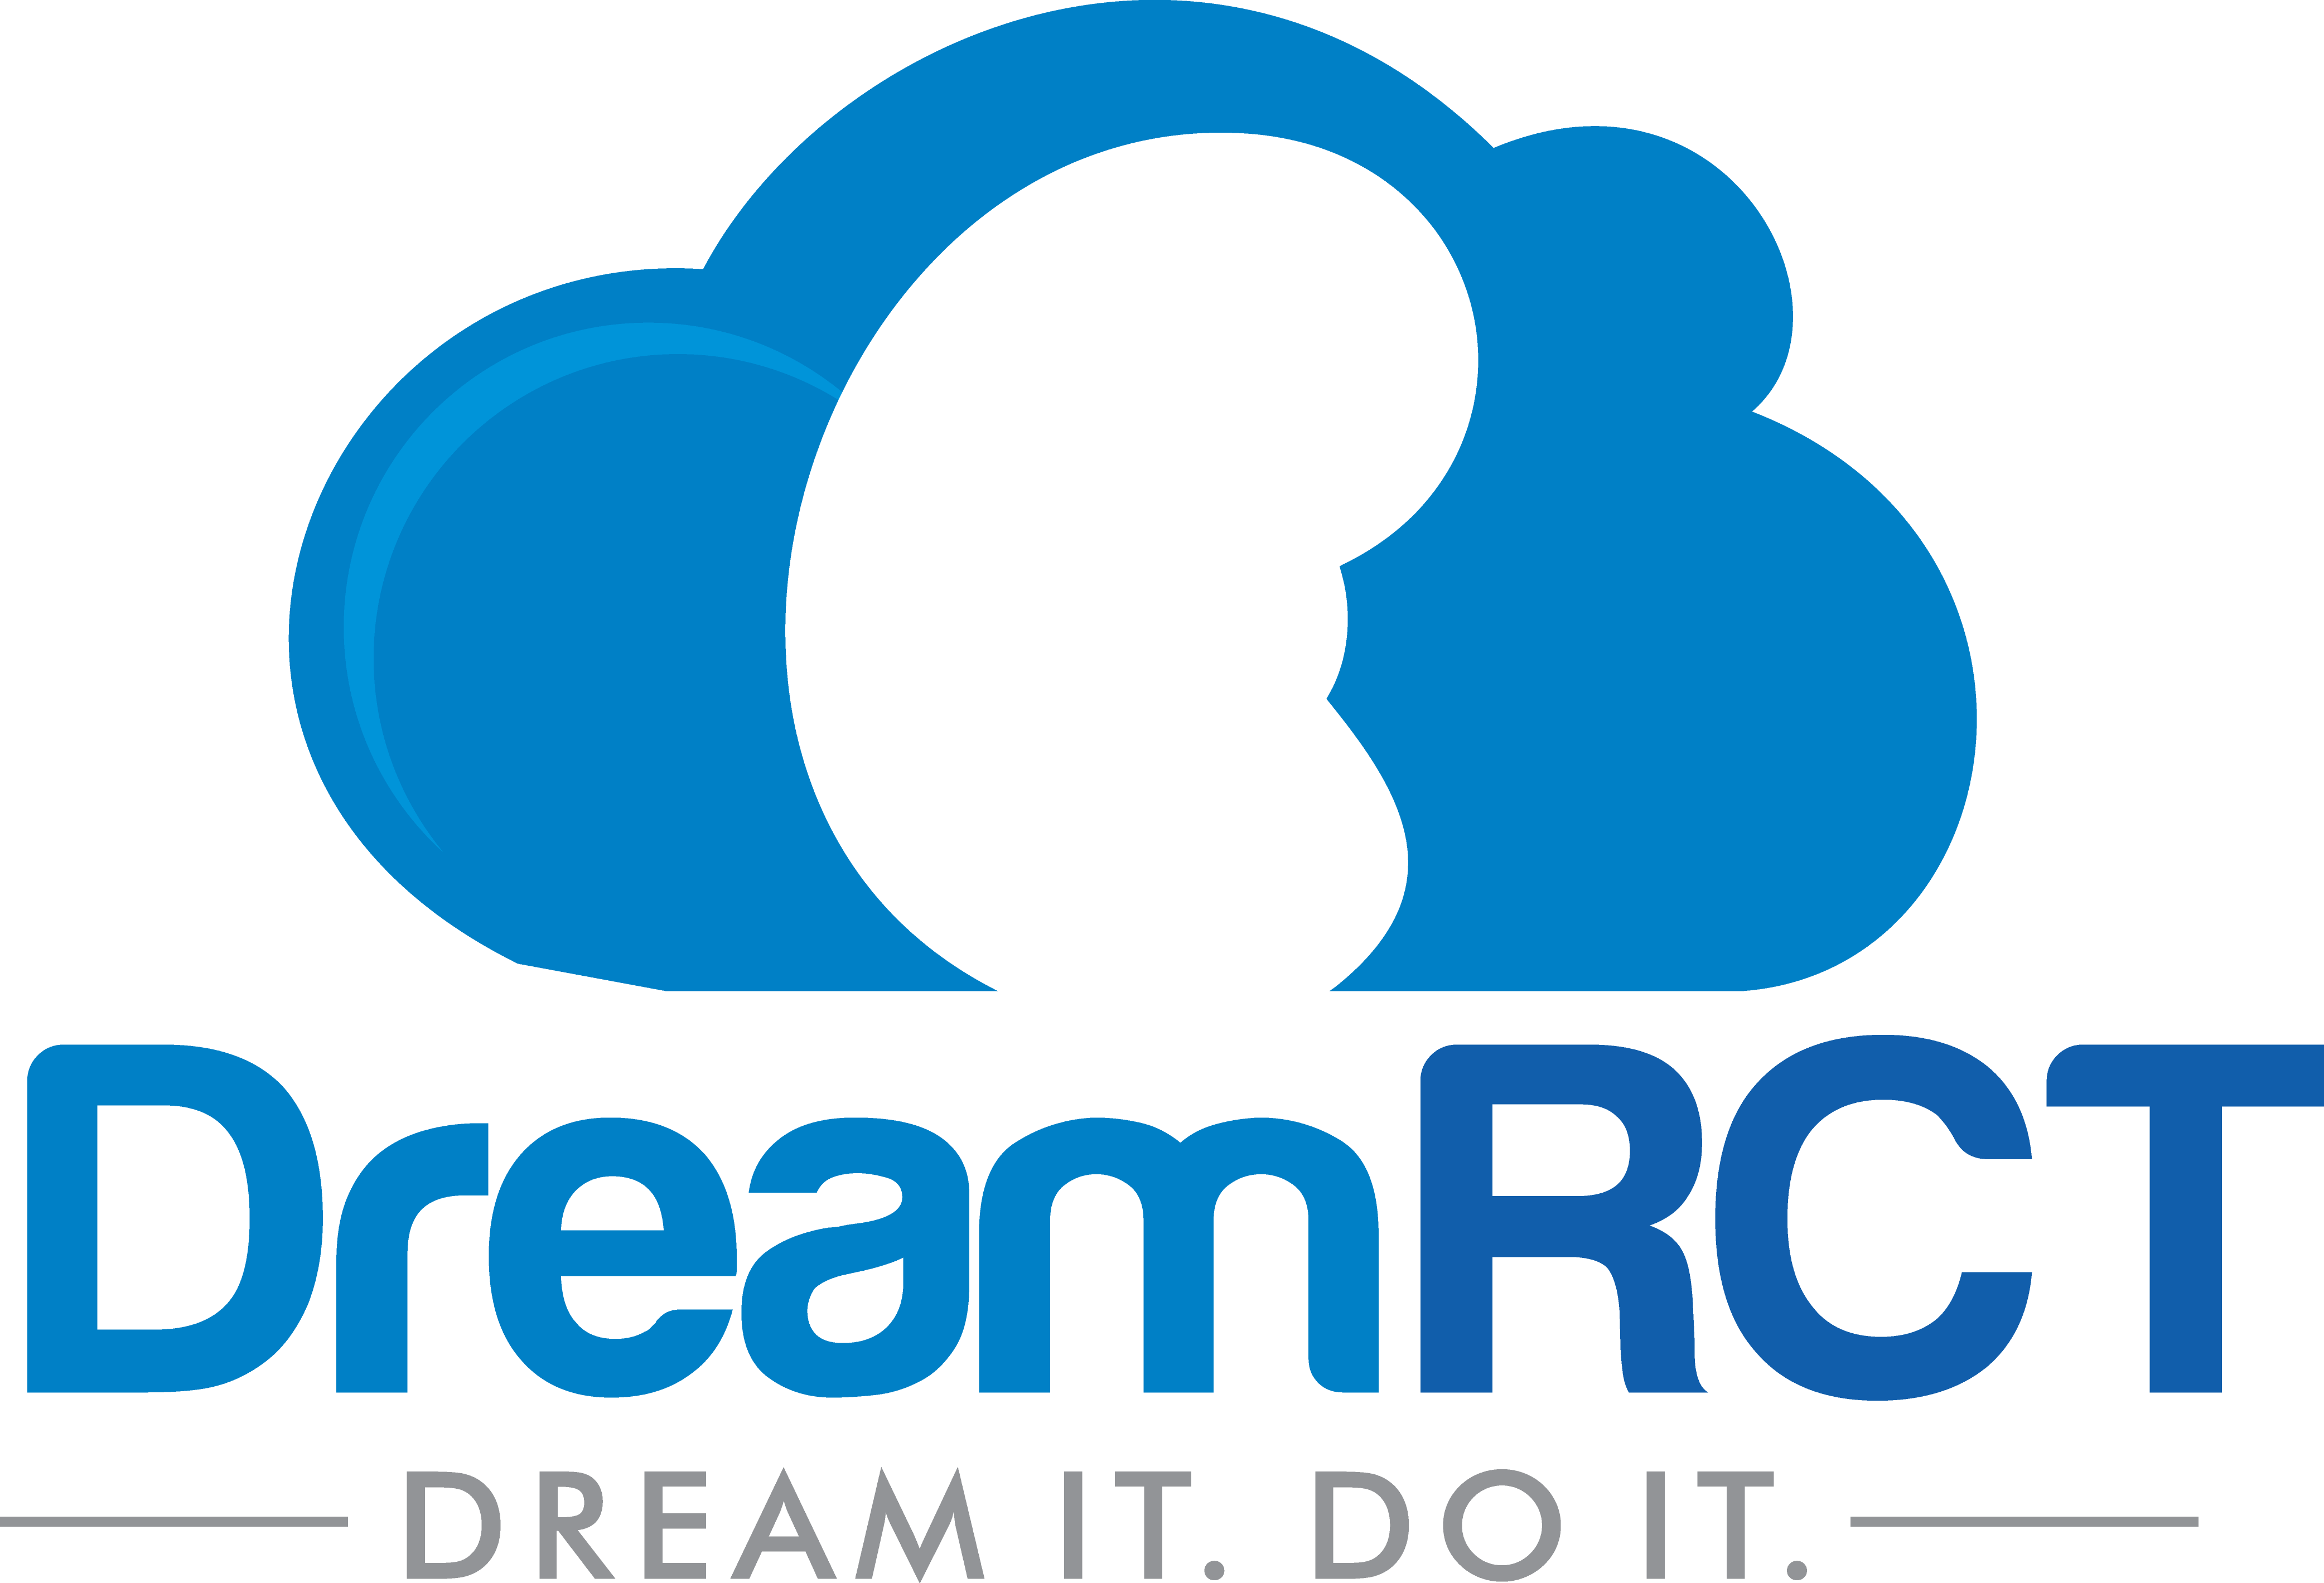 Dream RCT logo _LG-1